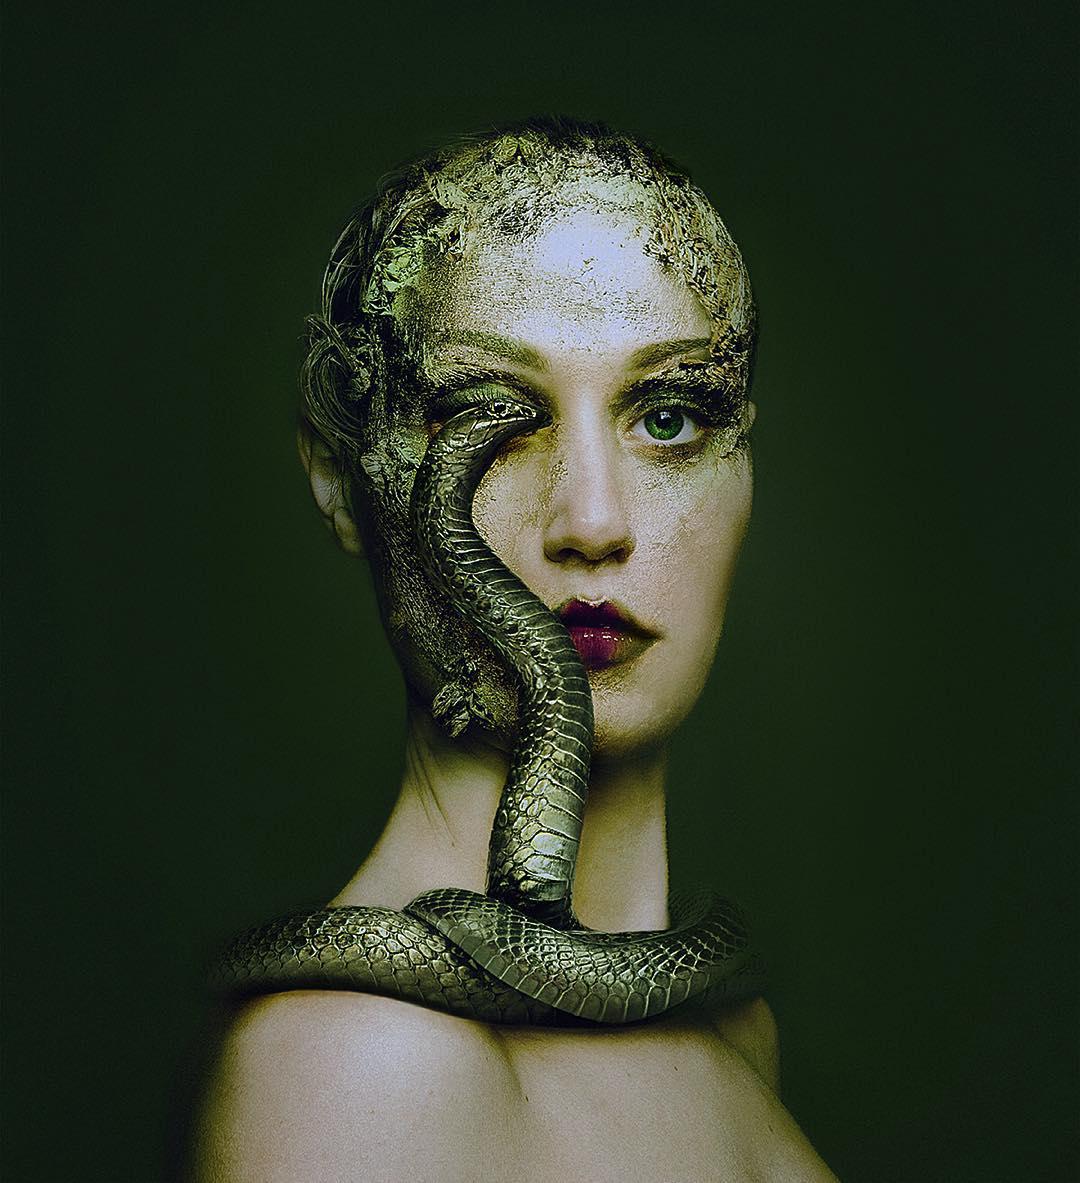 combines_human_and_animal_4